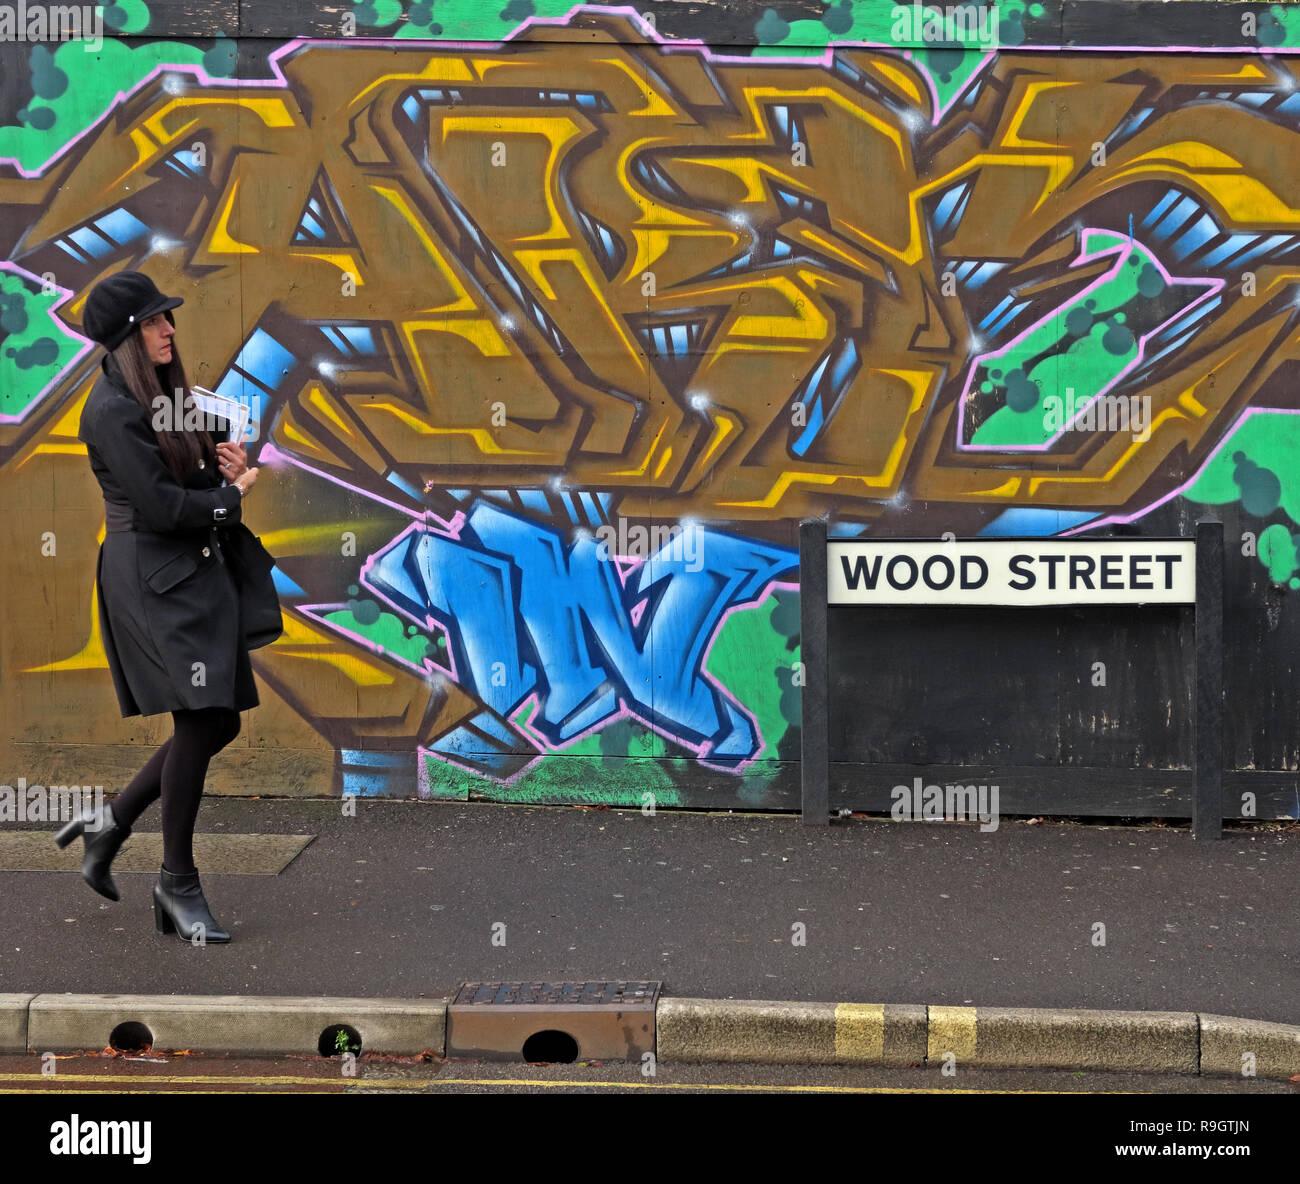 GoTonySmith,@HotpixUK,HotpixUK,Somerset,South West England,UK,Woman in black,walking past graffiti,colorful,colourful,contract,lady,walks,walking,walking past,TA1